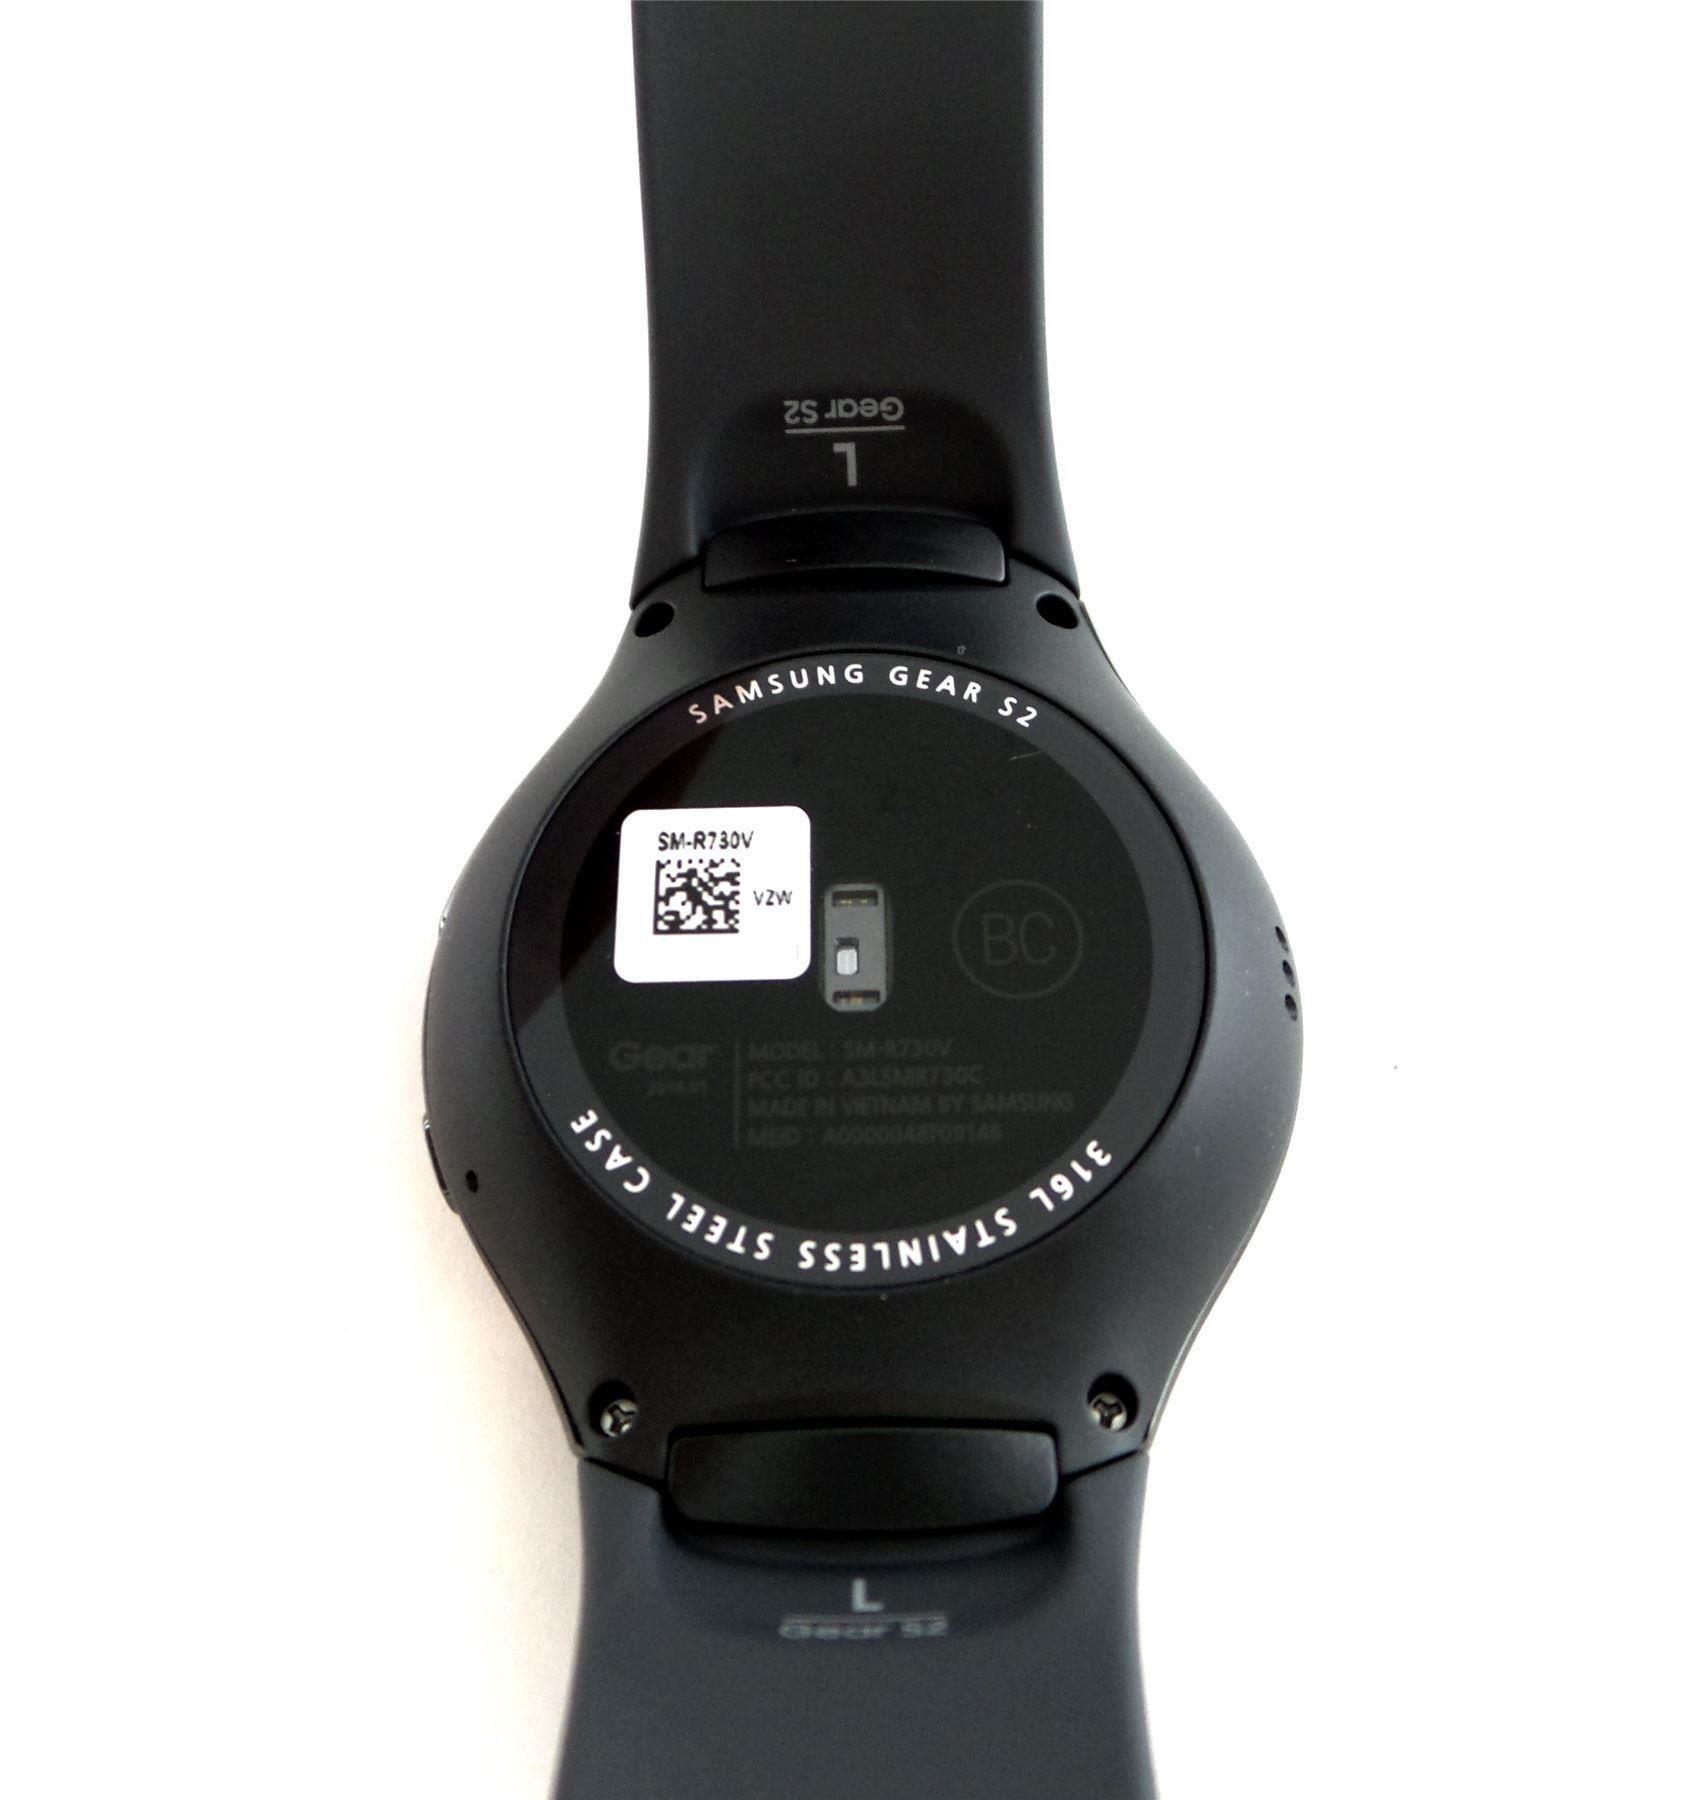 Samsung Gear S2 Smartwatch Black/Gray Large Band Verizon ...